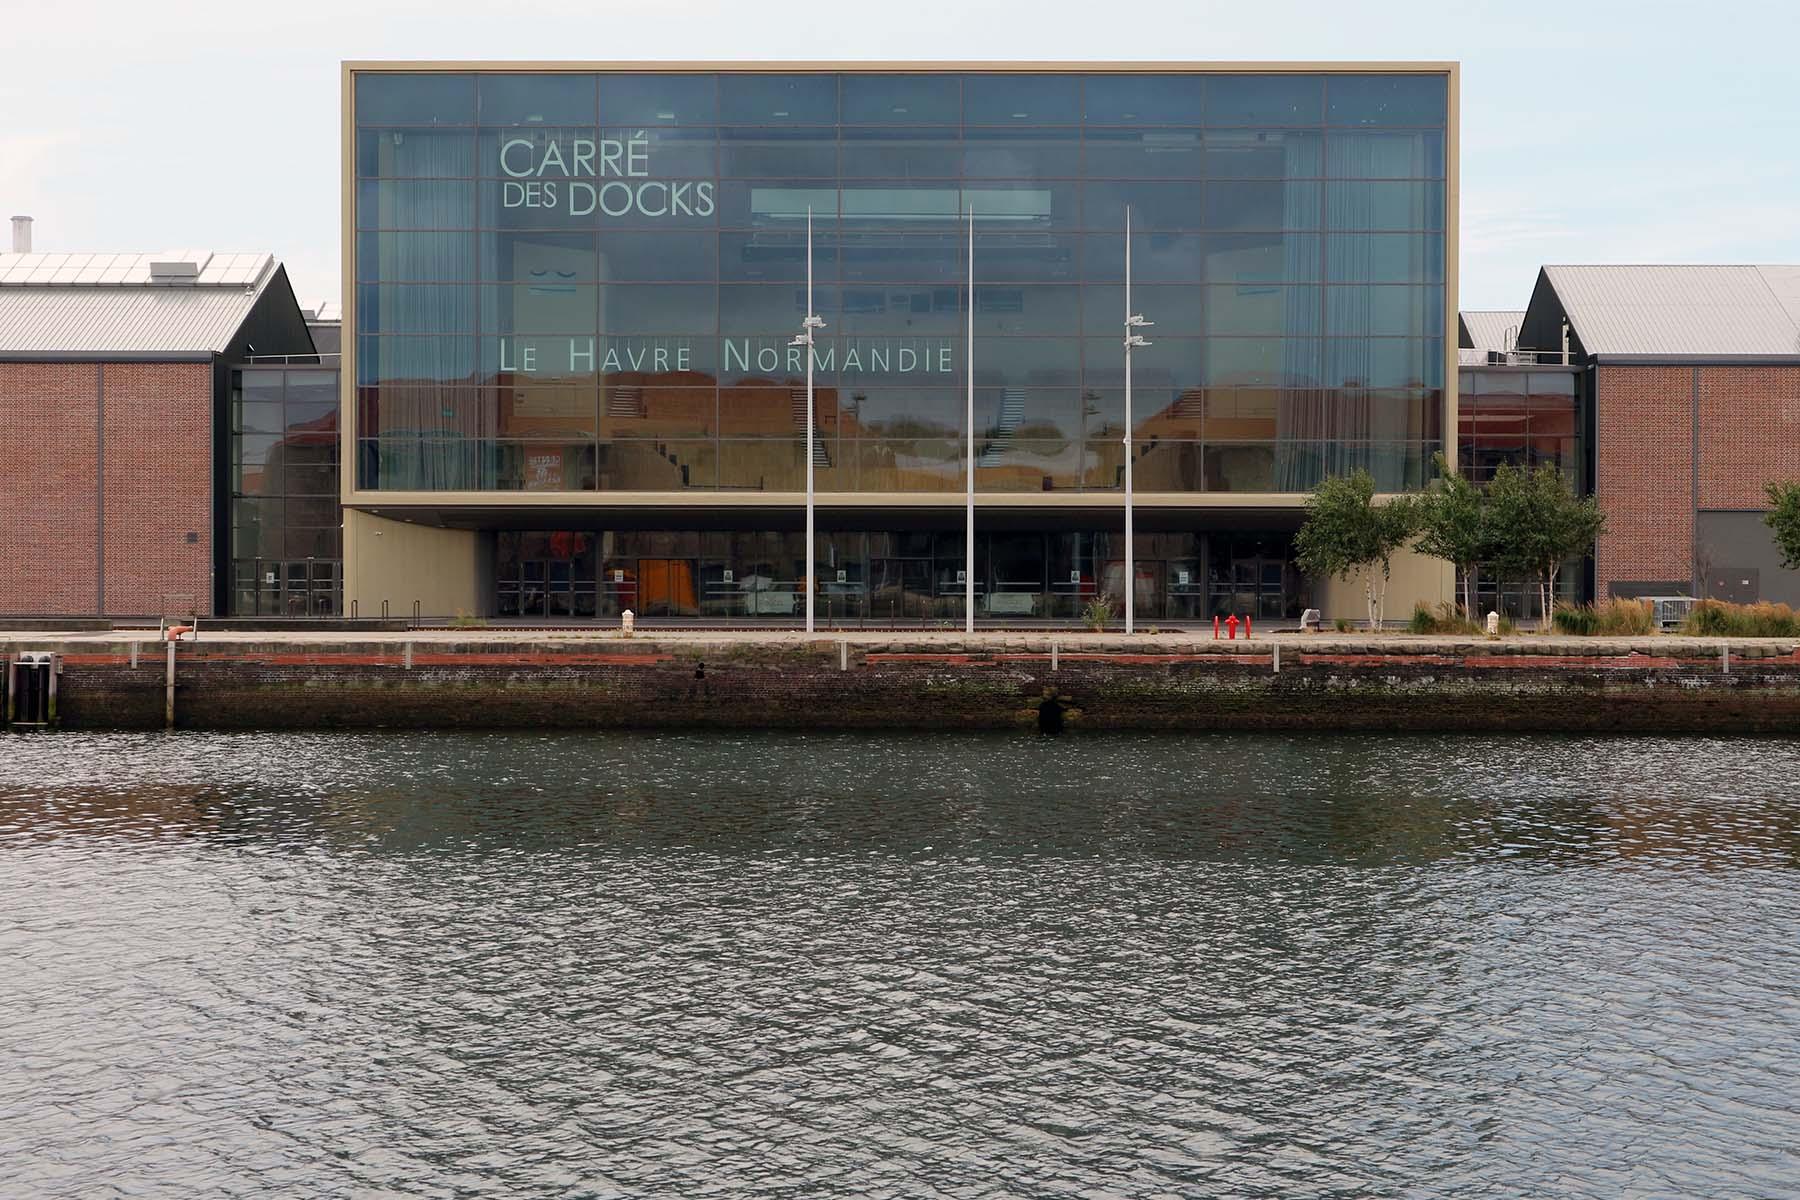 Parcours Les Bassins.  Ein weiteres Highlight das Kongresszentrum Carré des Docks von Paul Andreu und Thomas Richez.